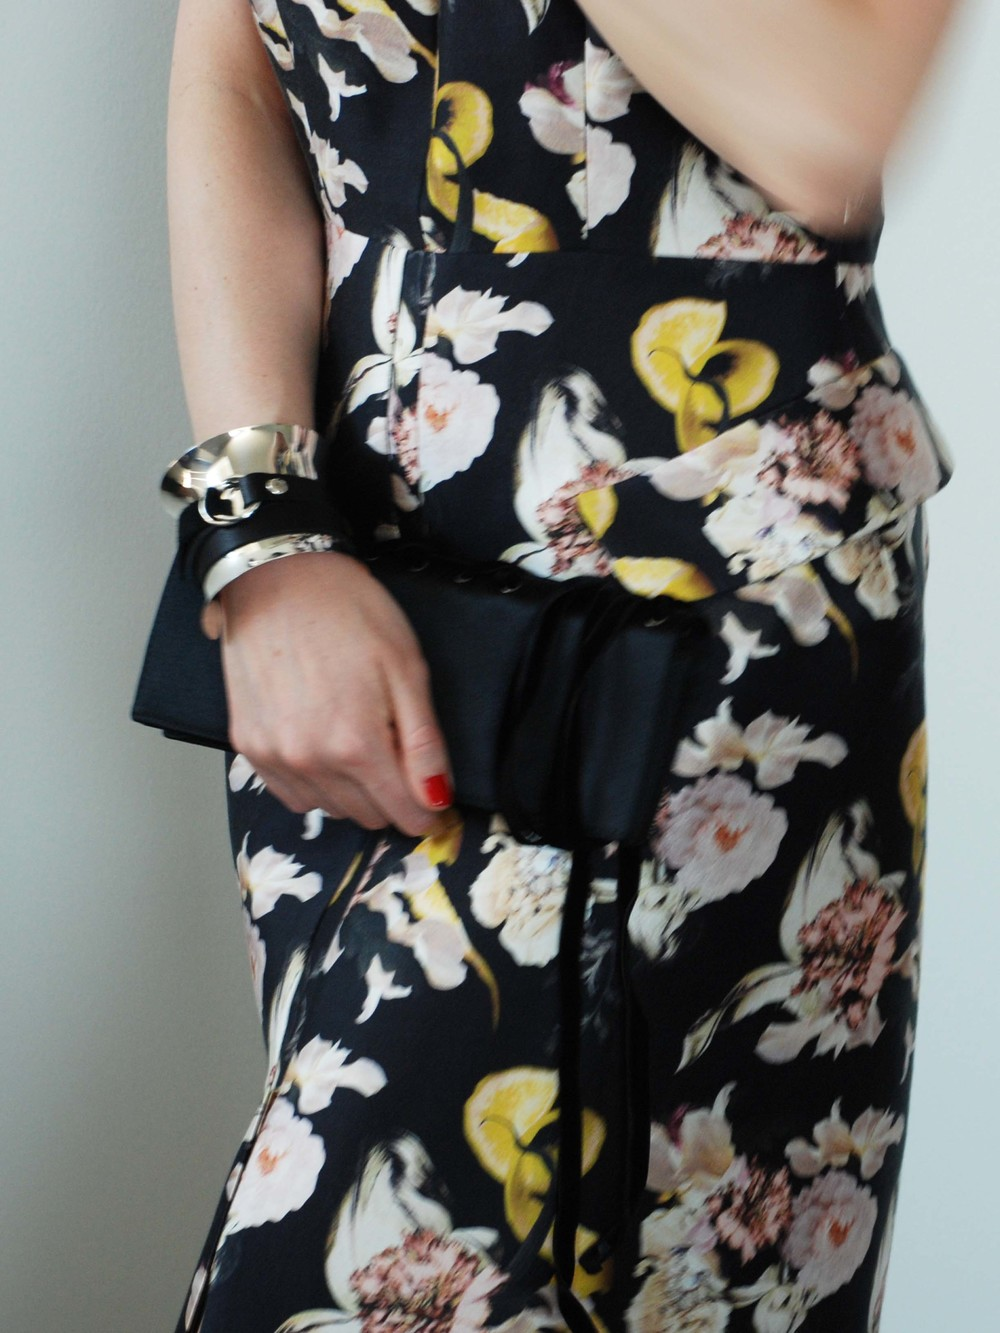 Ellery Dartagnan Dress with A-Line Skirt (Myer, $950AUD), Yves Saint Laurent Vintage Clutch (Ebay), Georg Jensen Cuff